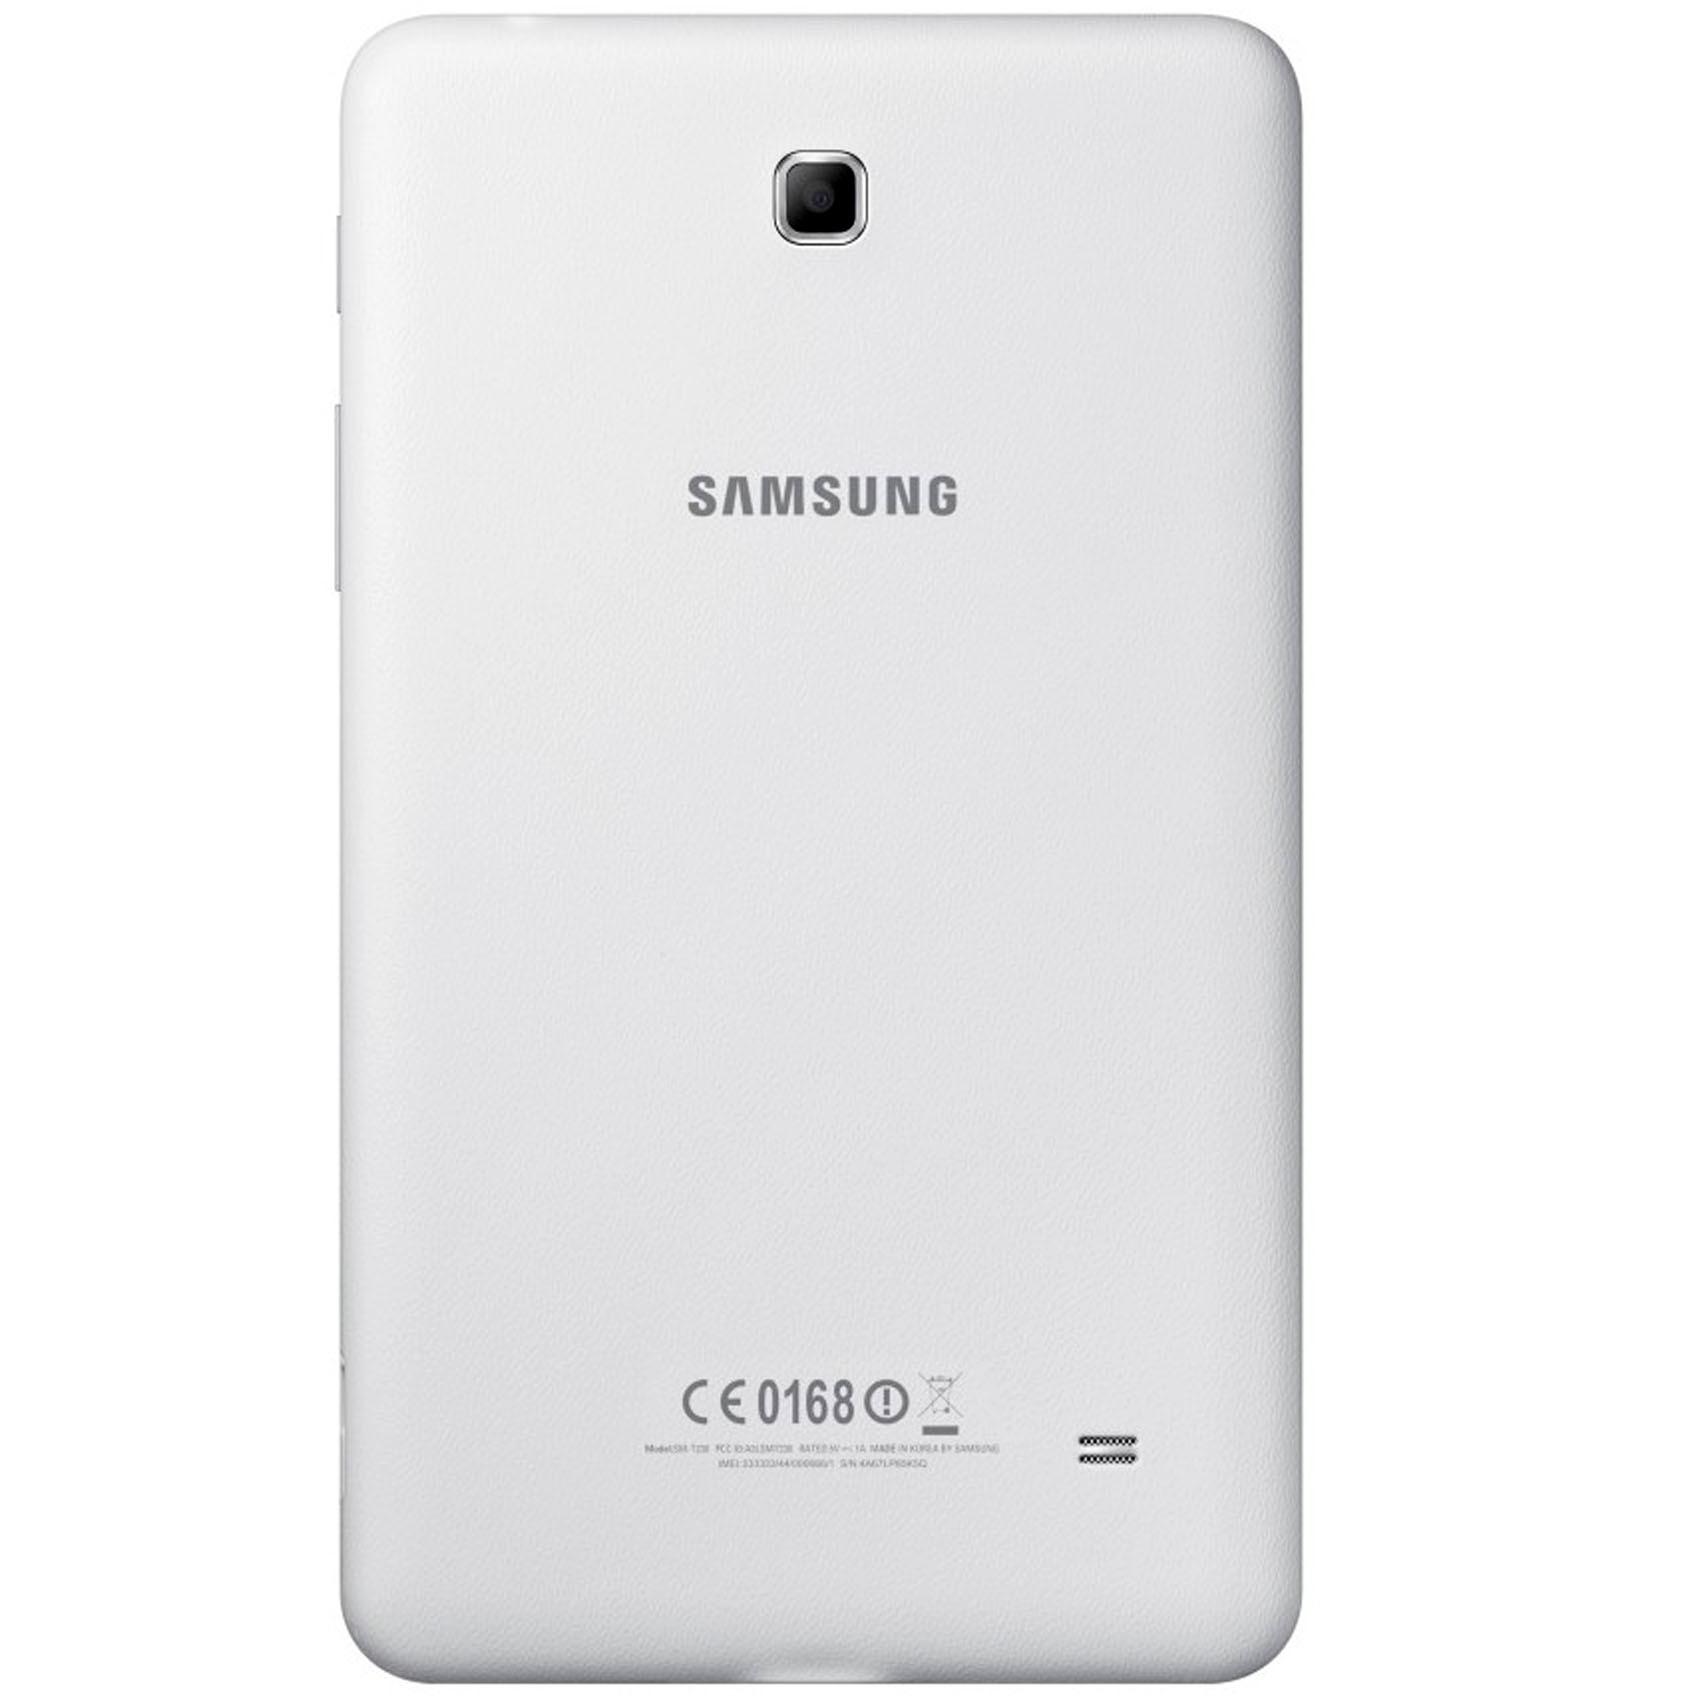 SAMSUNG TAB T231 WH QC 1/8/3G/7